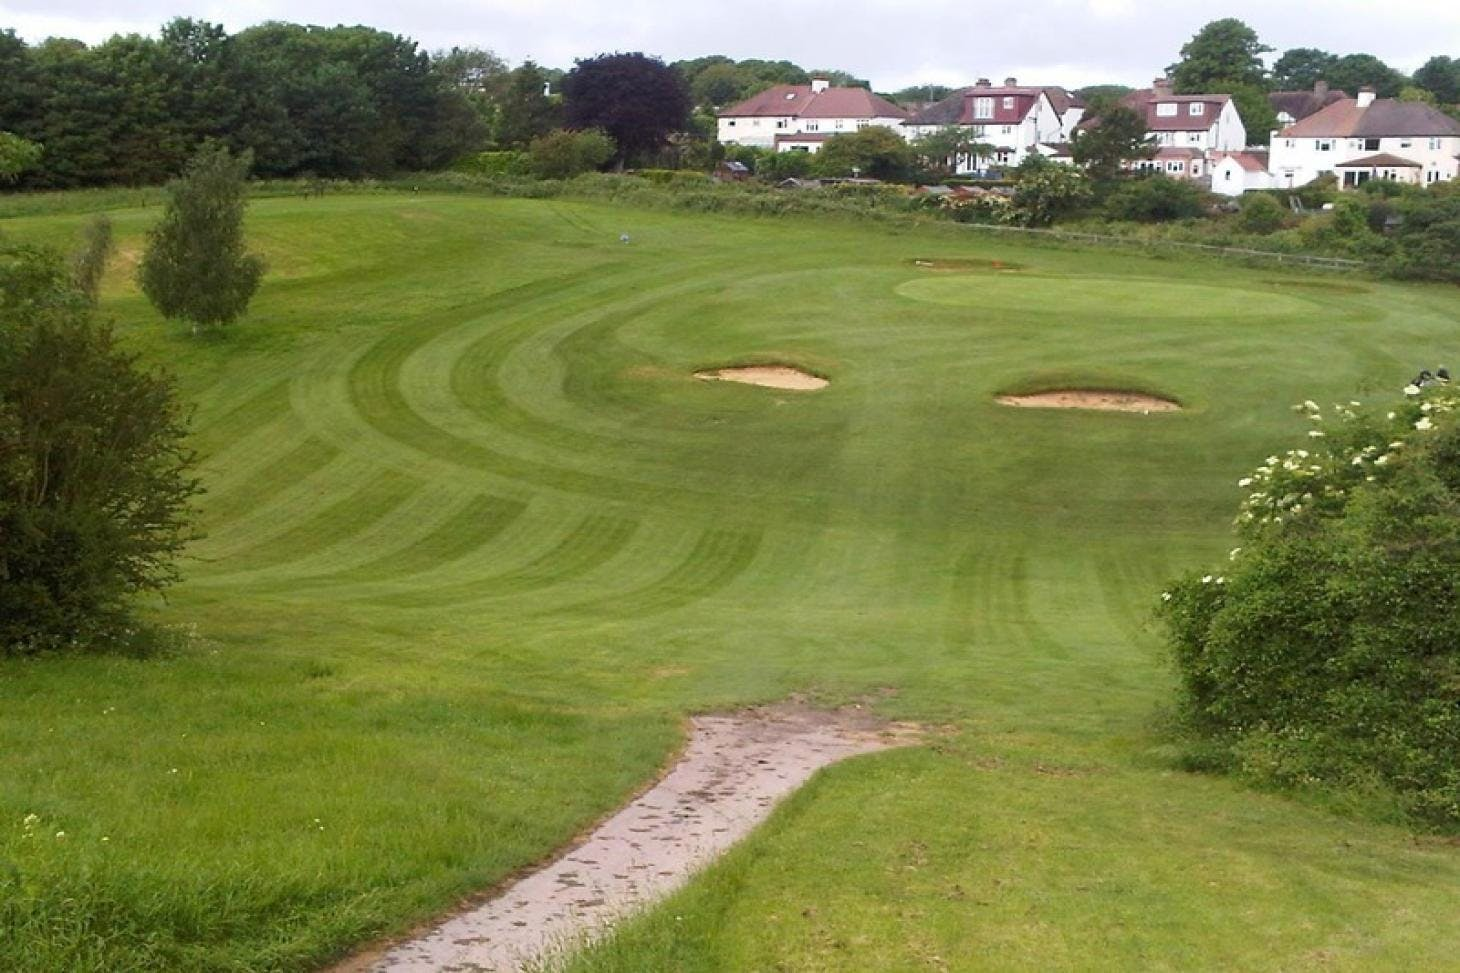 Oaks Sports Centre Golf Club 9 hole golf course